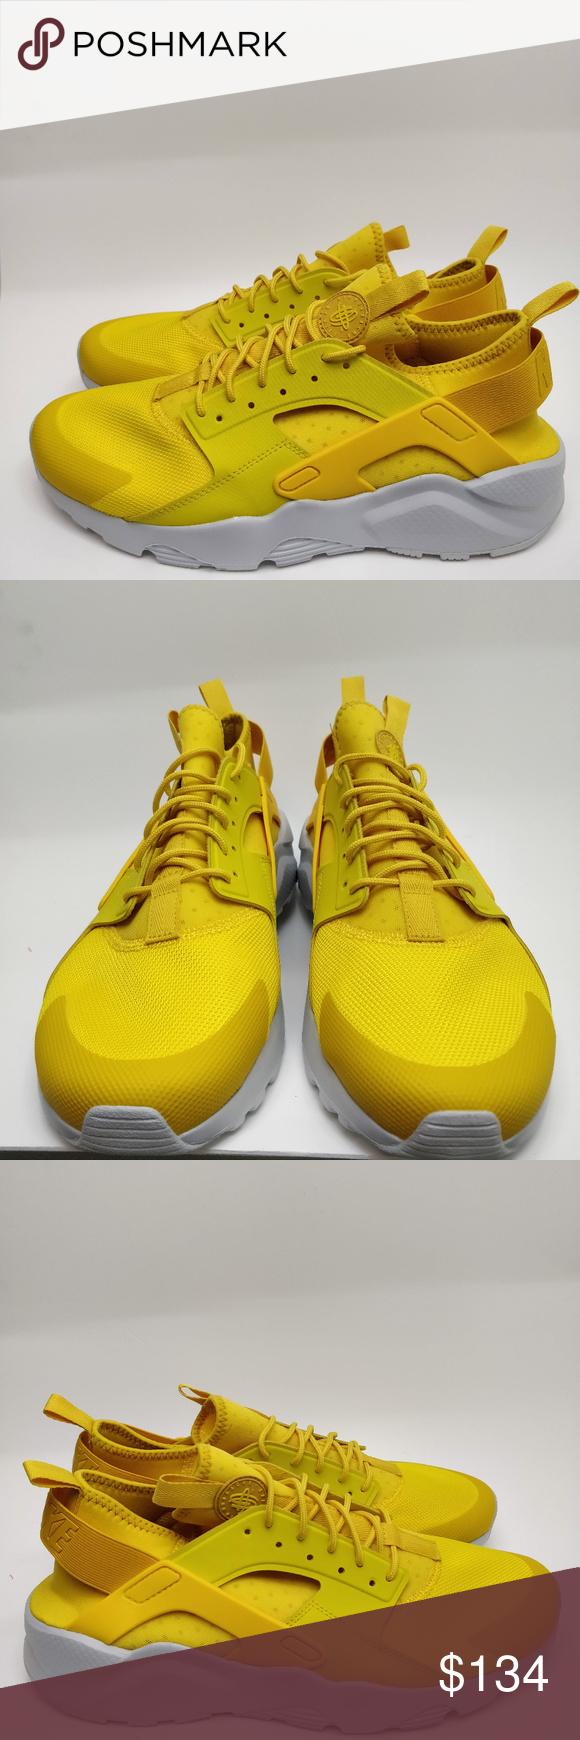 9e5480cd04a7 Nike Air Men Huarache Run Ultra Mineral Yellow Run Nike Air Men Huarache  Run Ultra Mineral Yellow Running Size 12 819685-700 Nike Shoes Sneakers